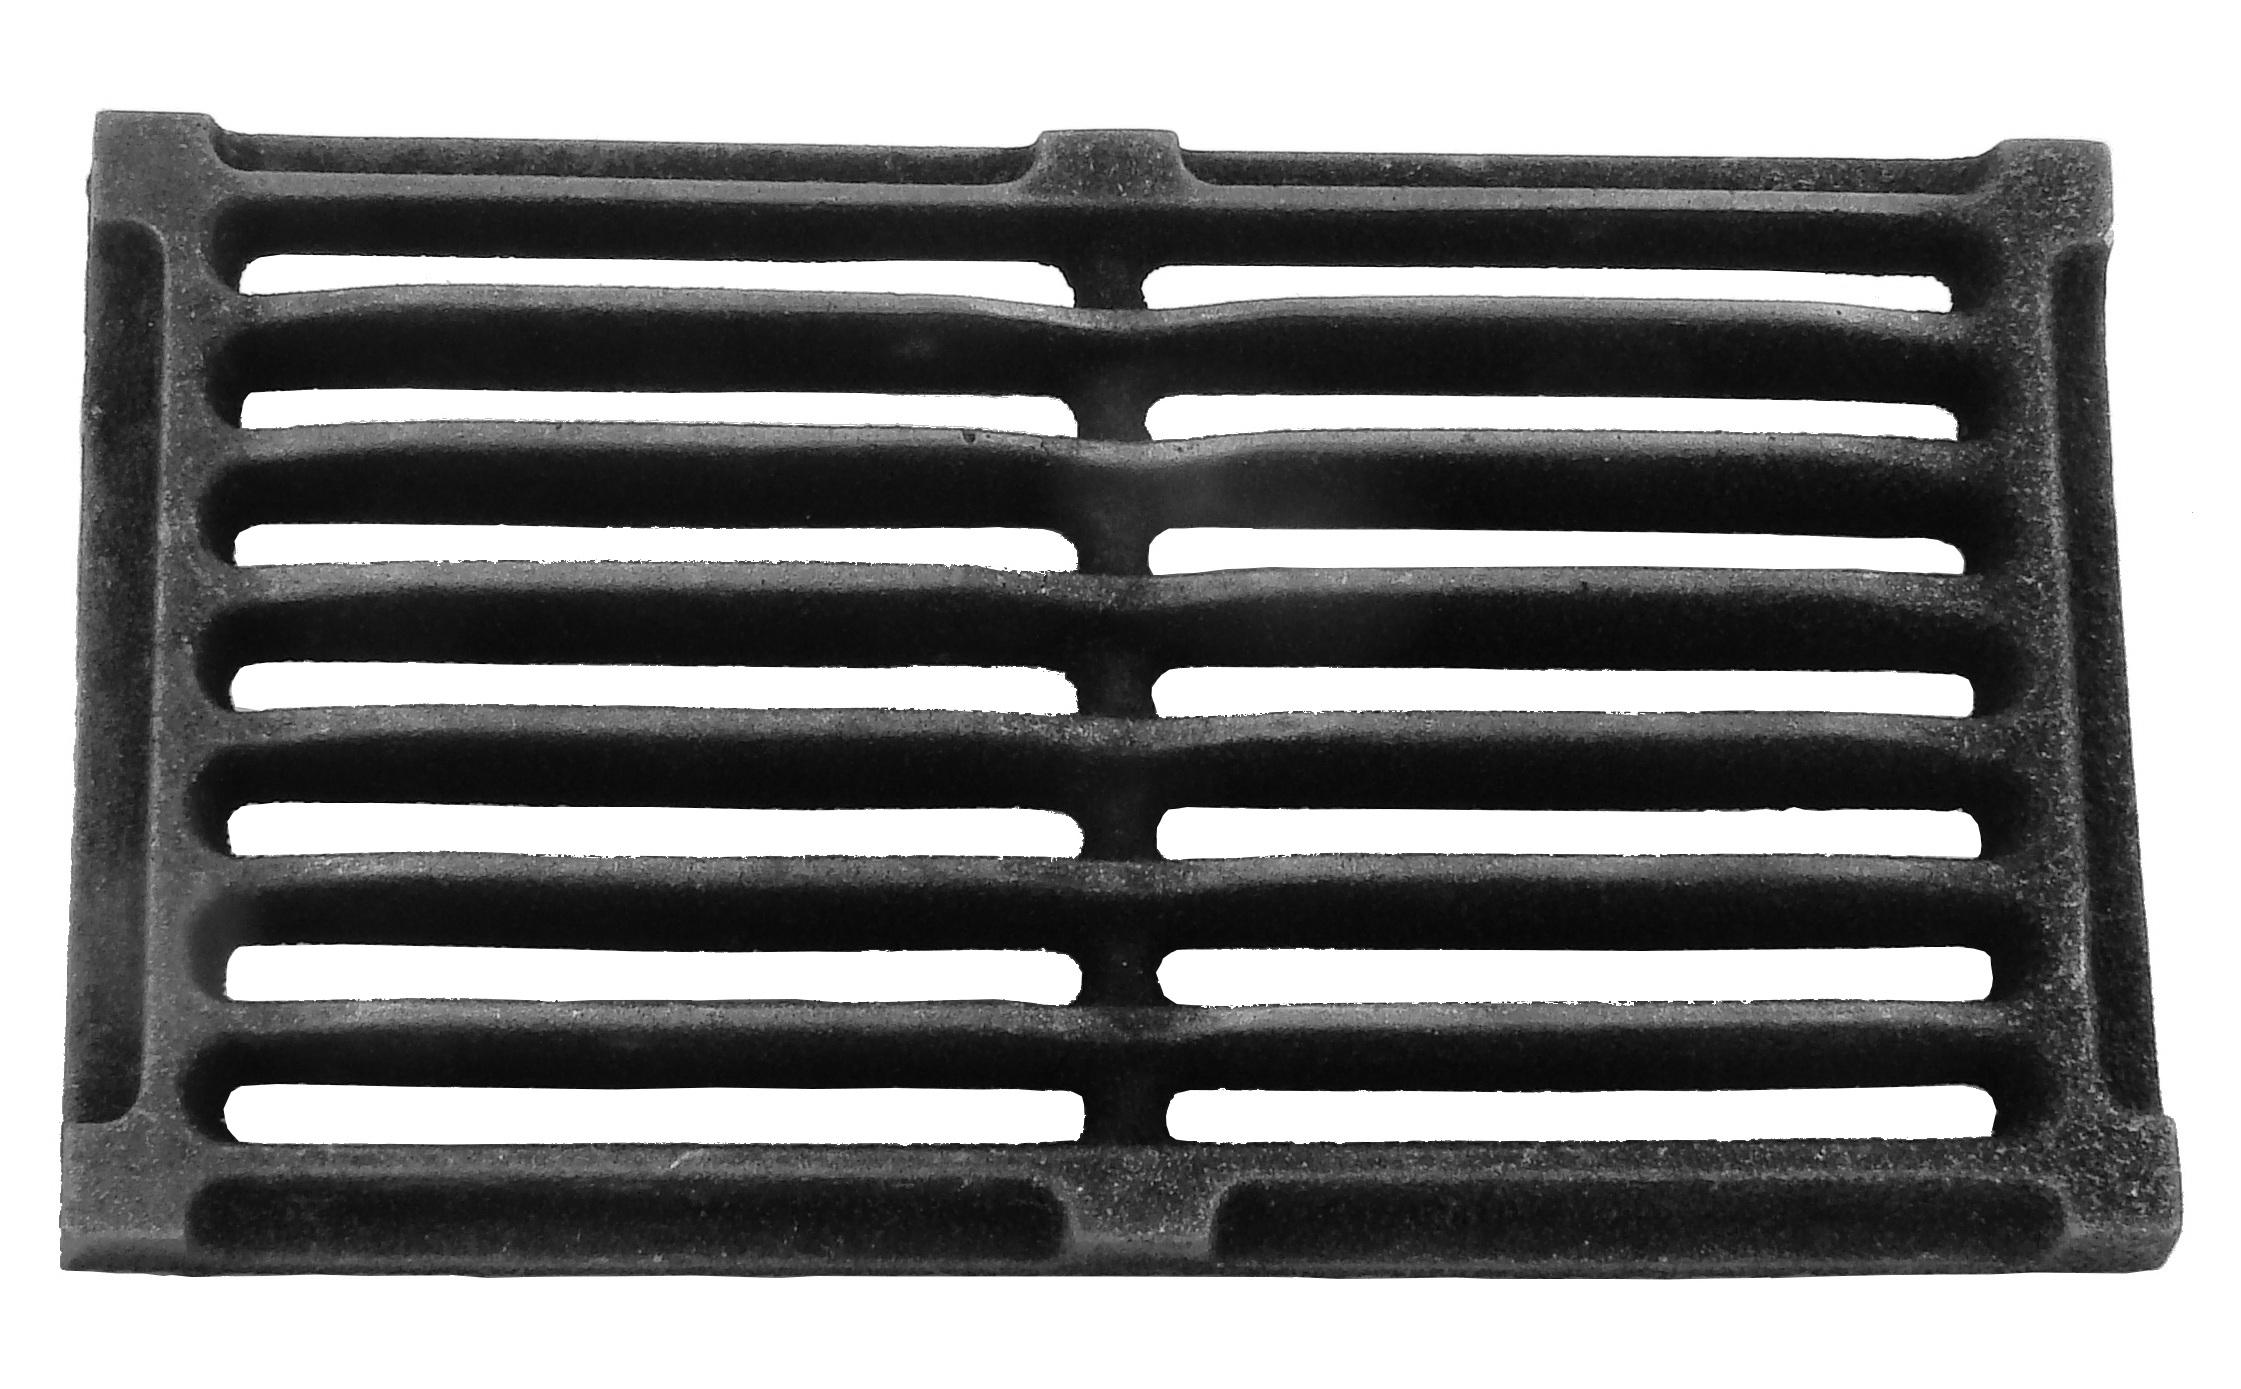 ascherost rechteckig oder rund viele gr en gussrost ofen rost feuerrost herd. Black Bedroom Furniture Sets. Home Design Ideas